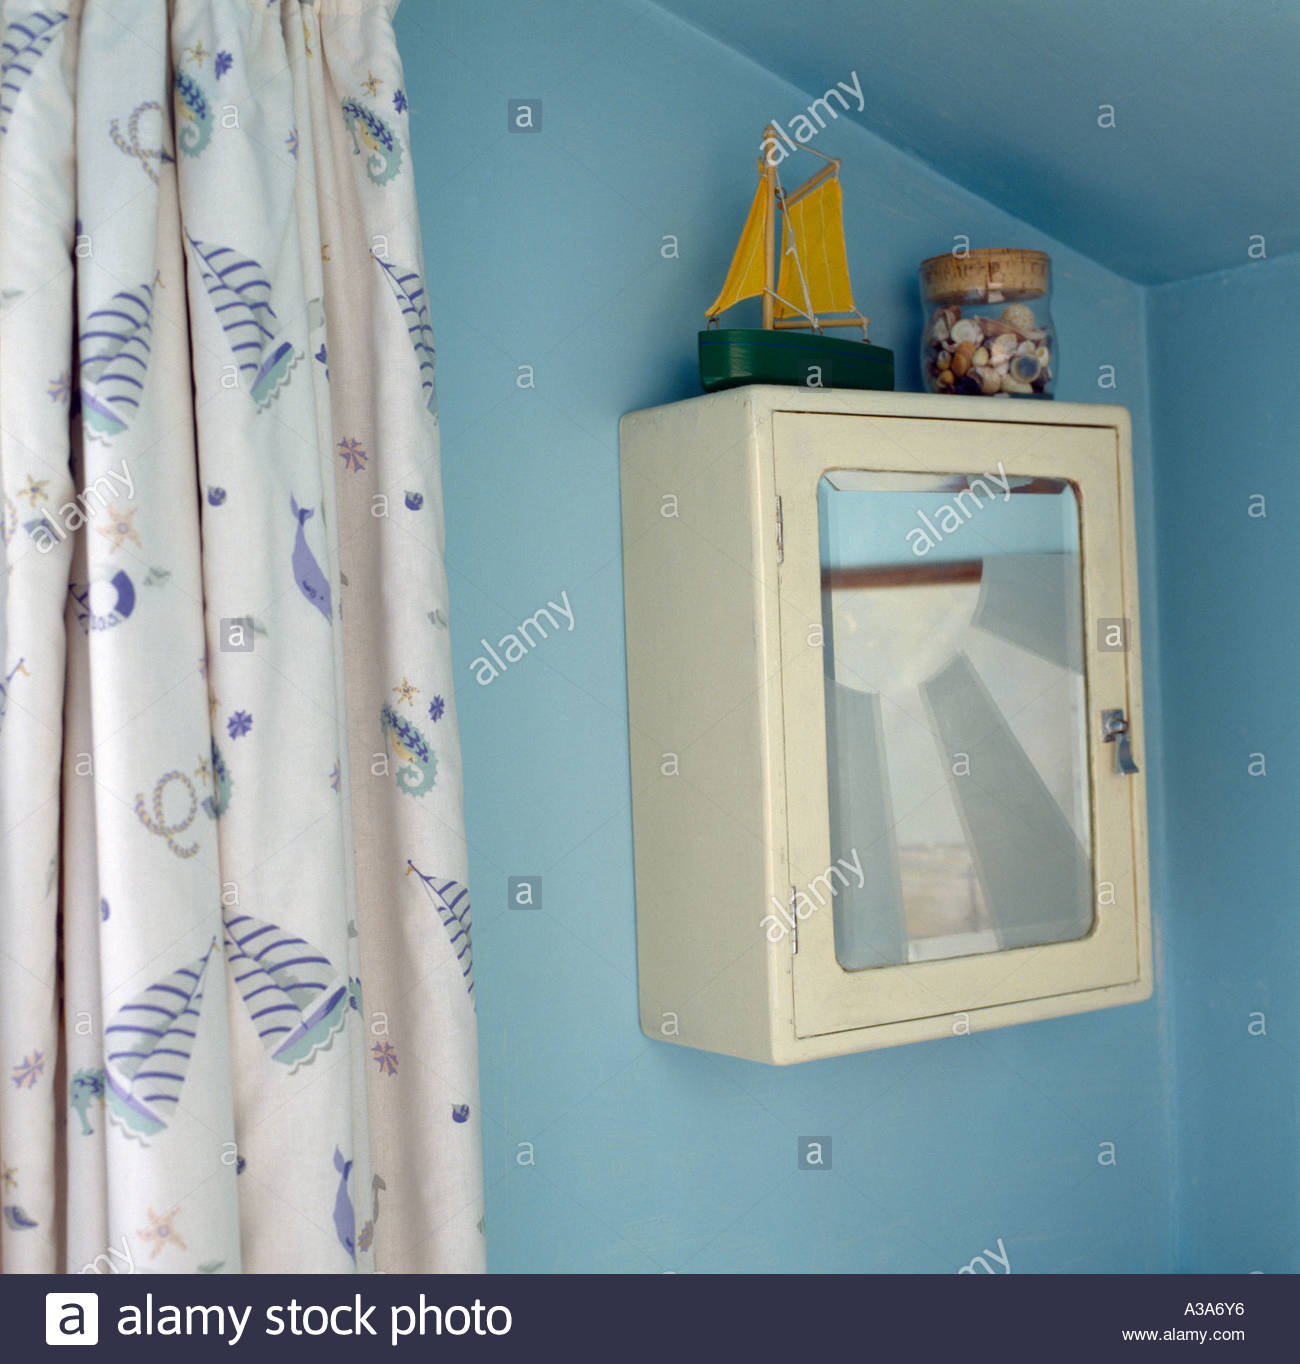 Bathroom Cabinet Stock Photos & Bathroom Cabinet Stock Images - Alamy